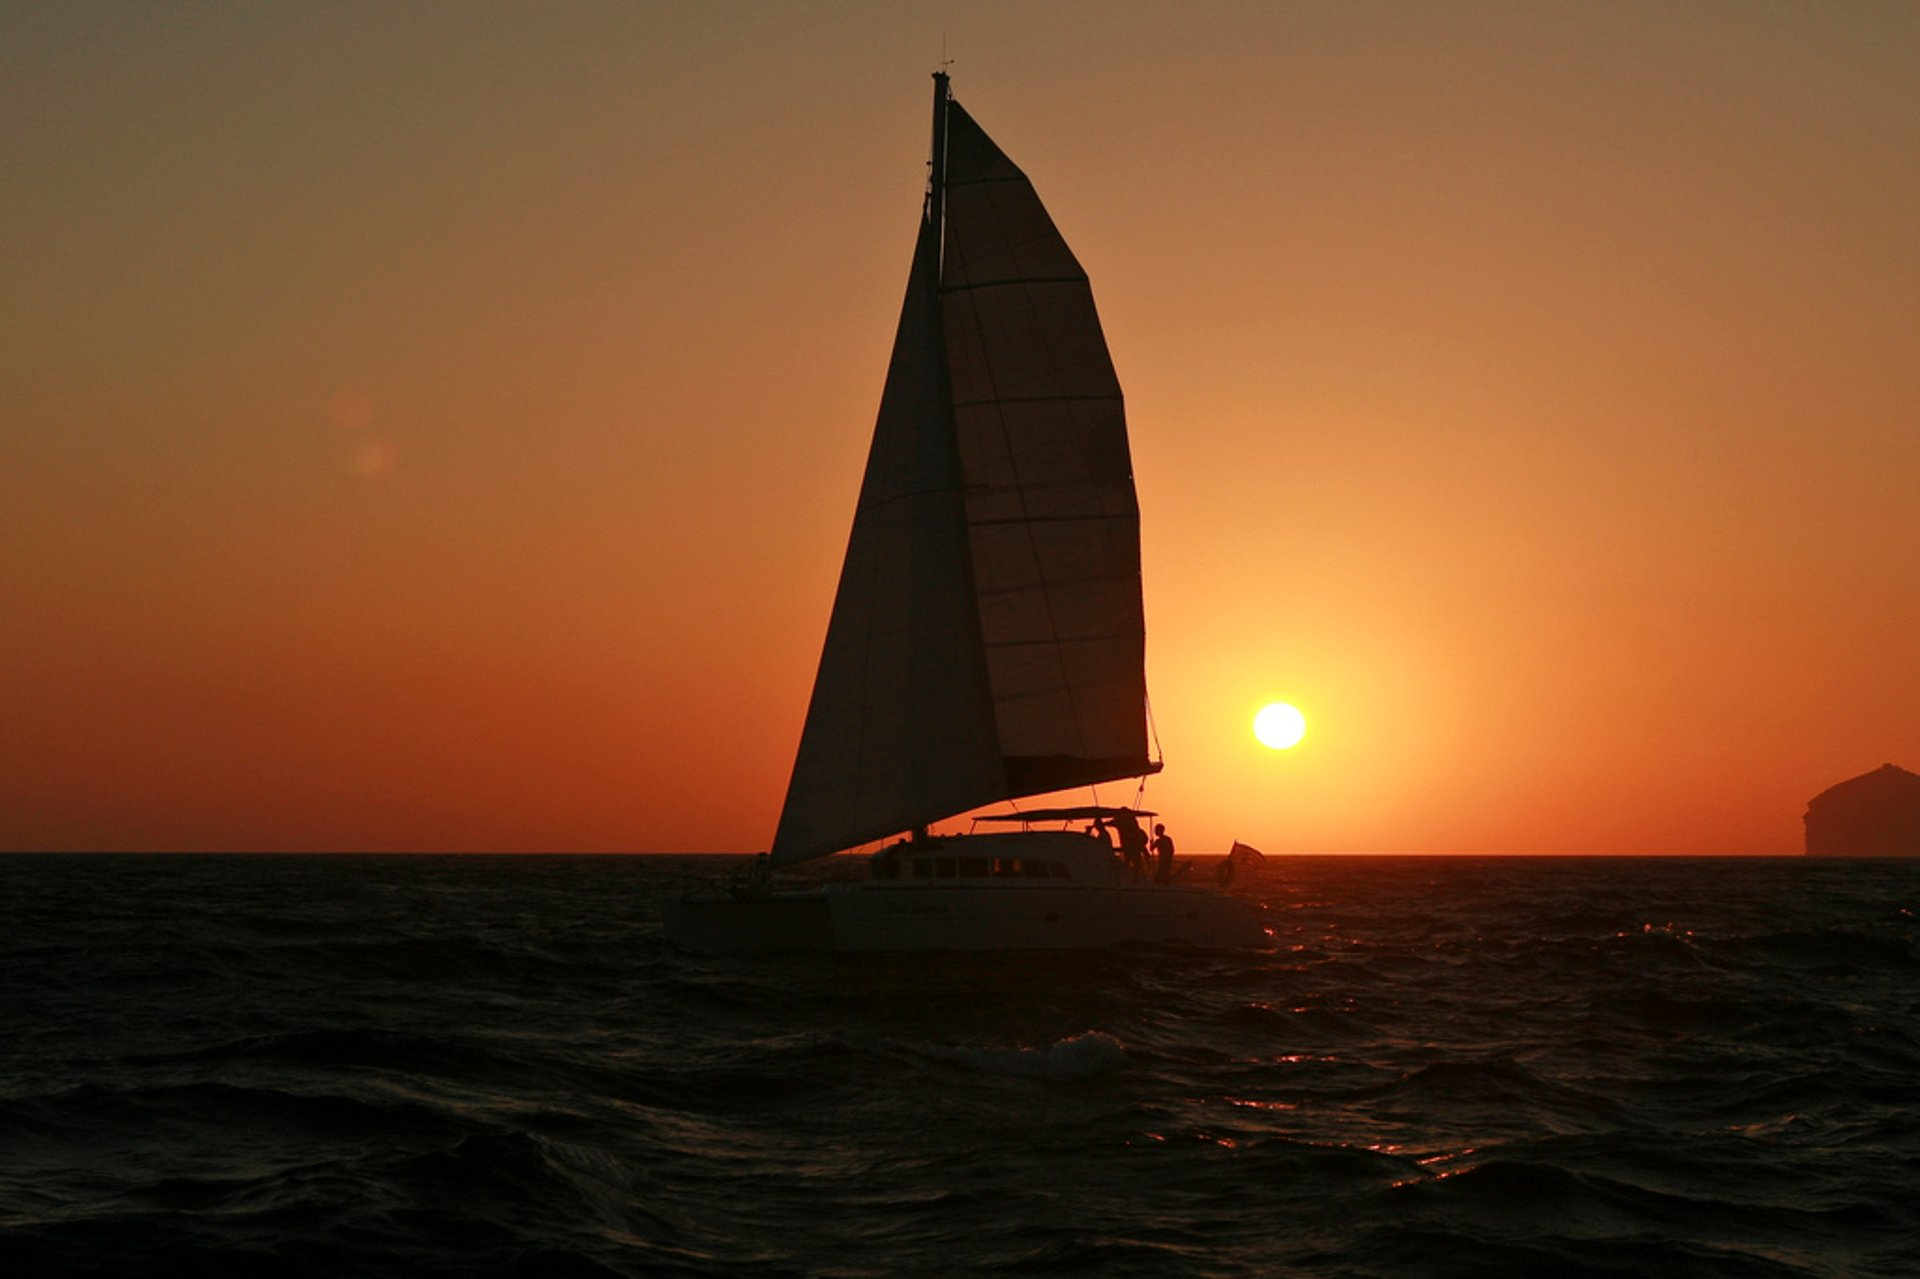 Sailing Season in Santorini 2020 - Best Time